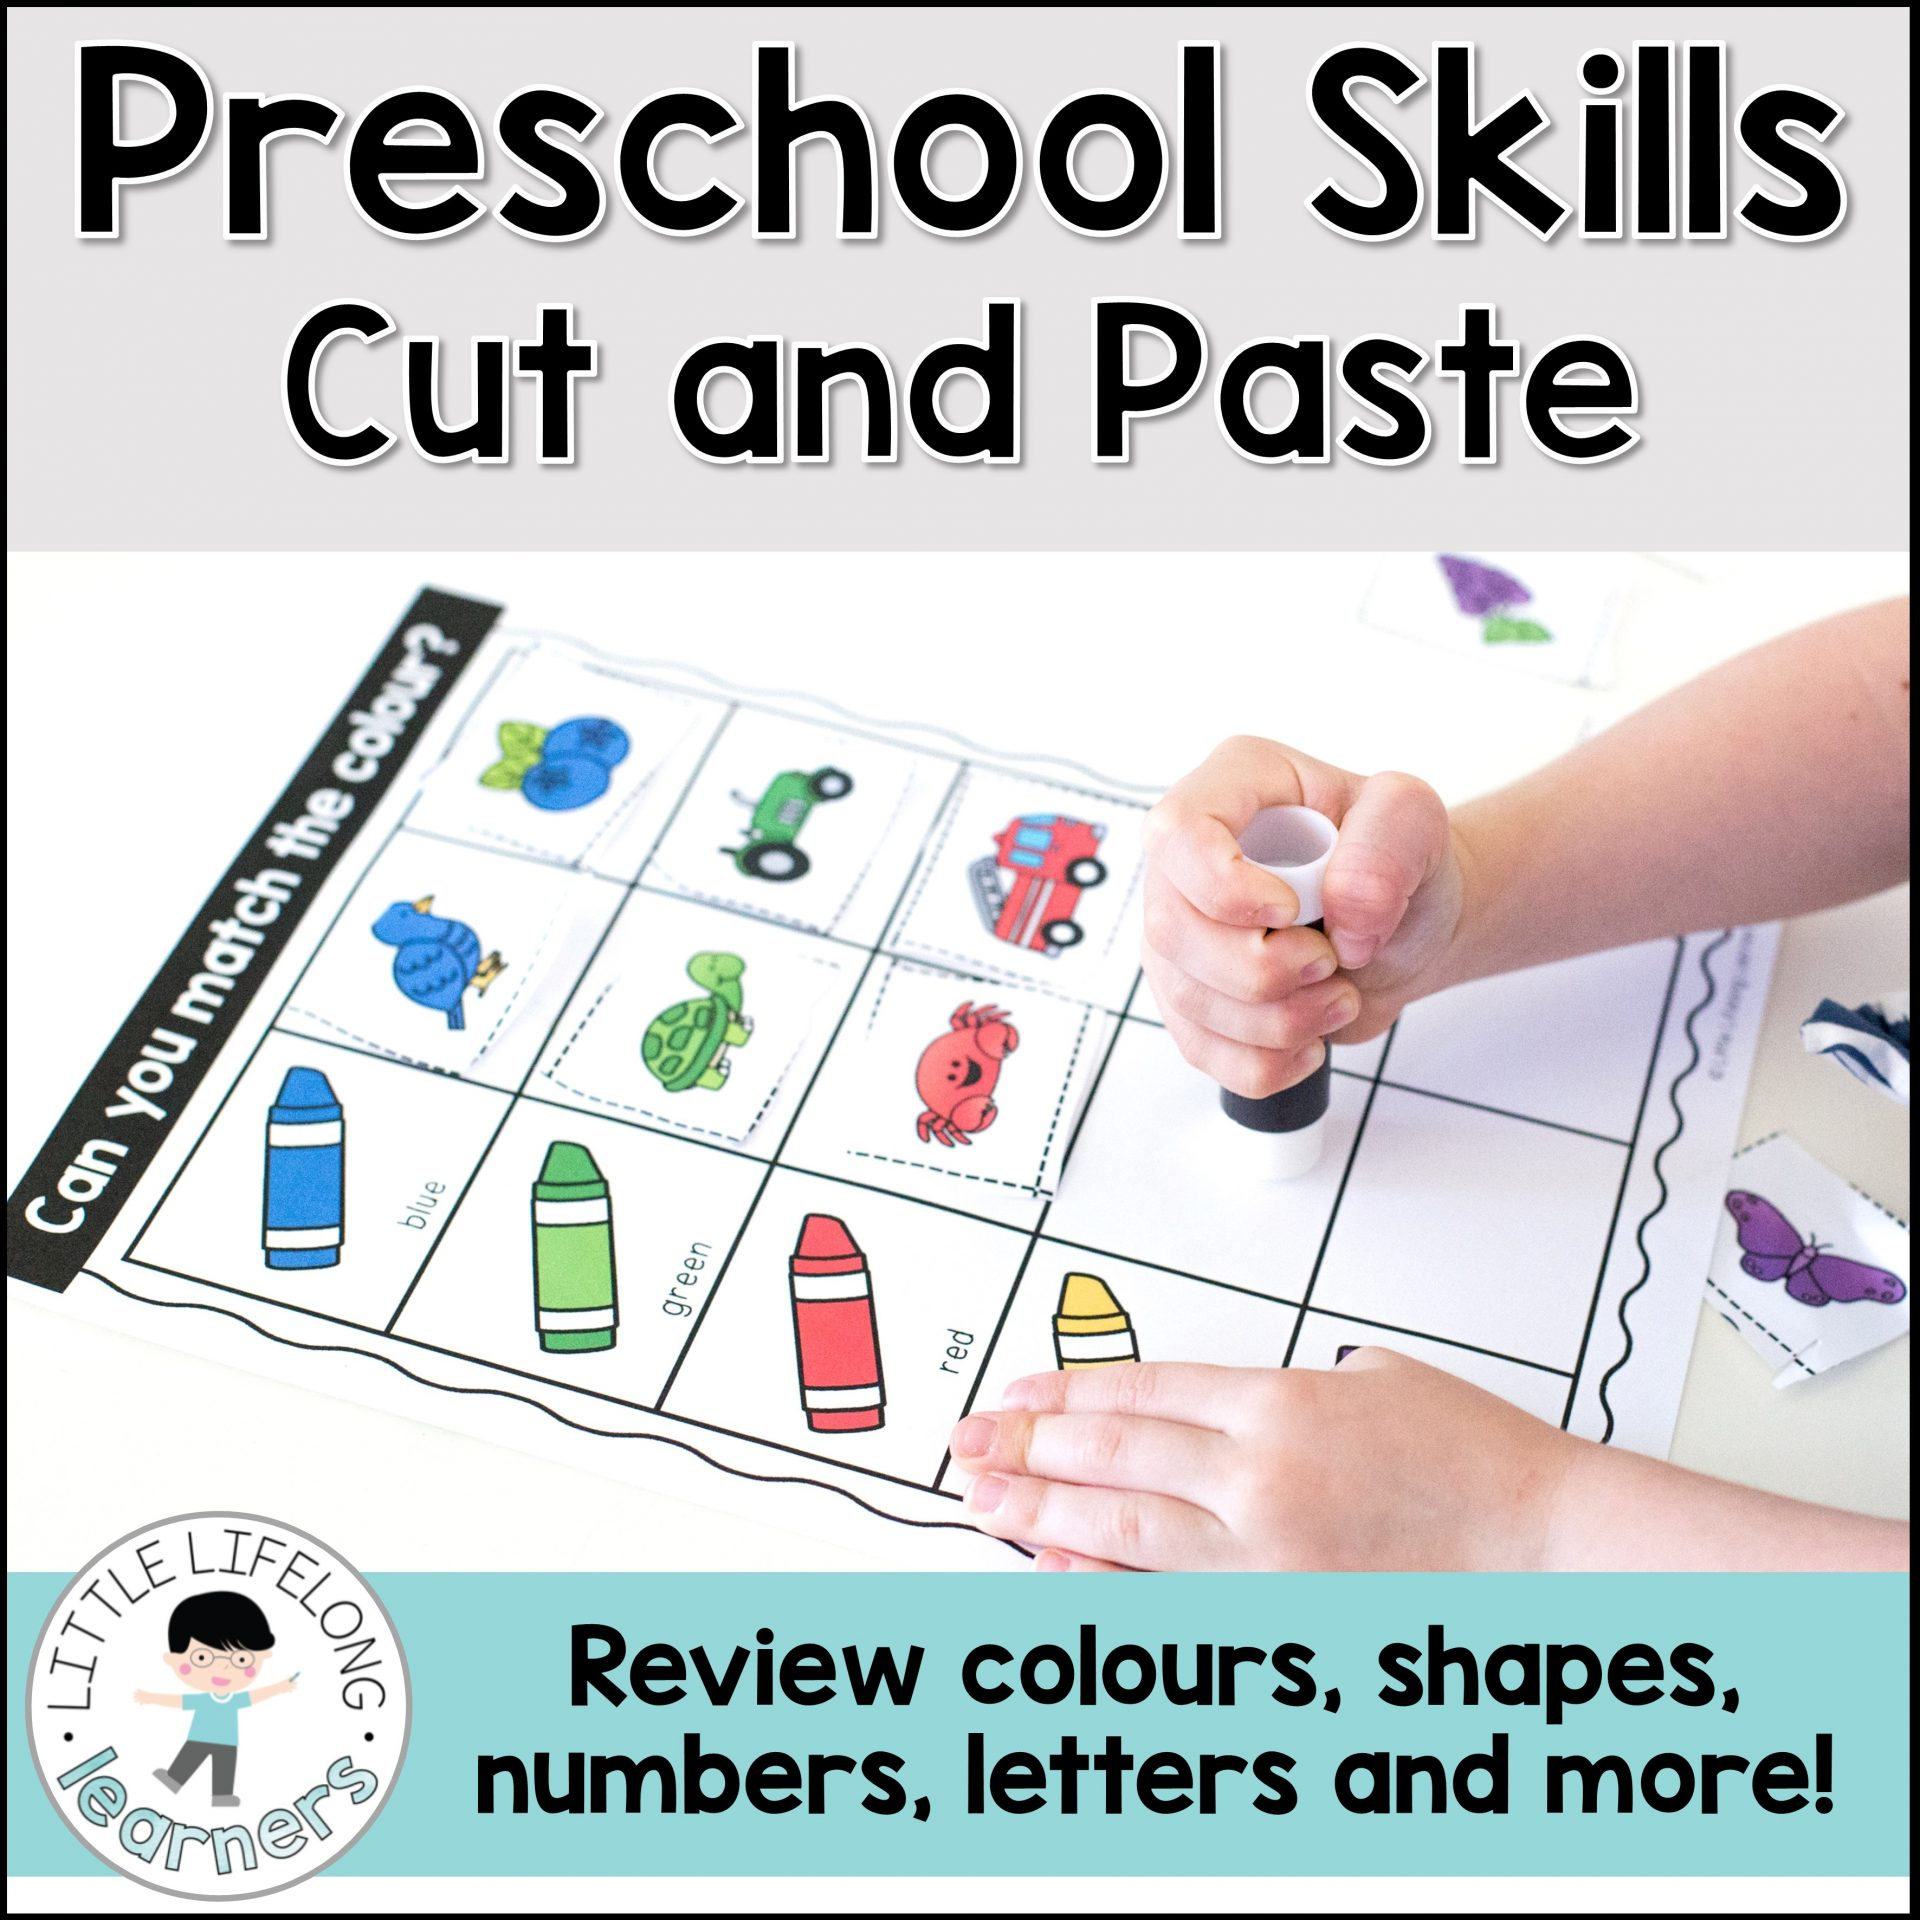 Preschool Sorting Skills - Cut and Paste Activities - The ...